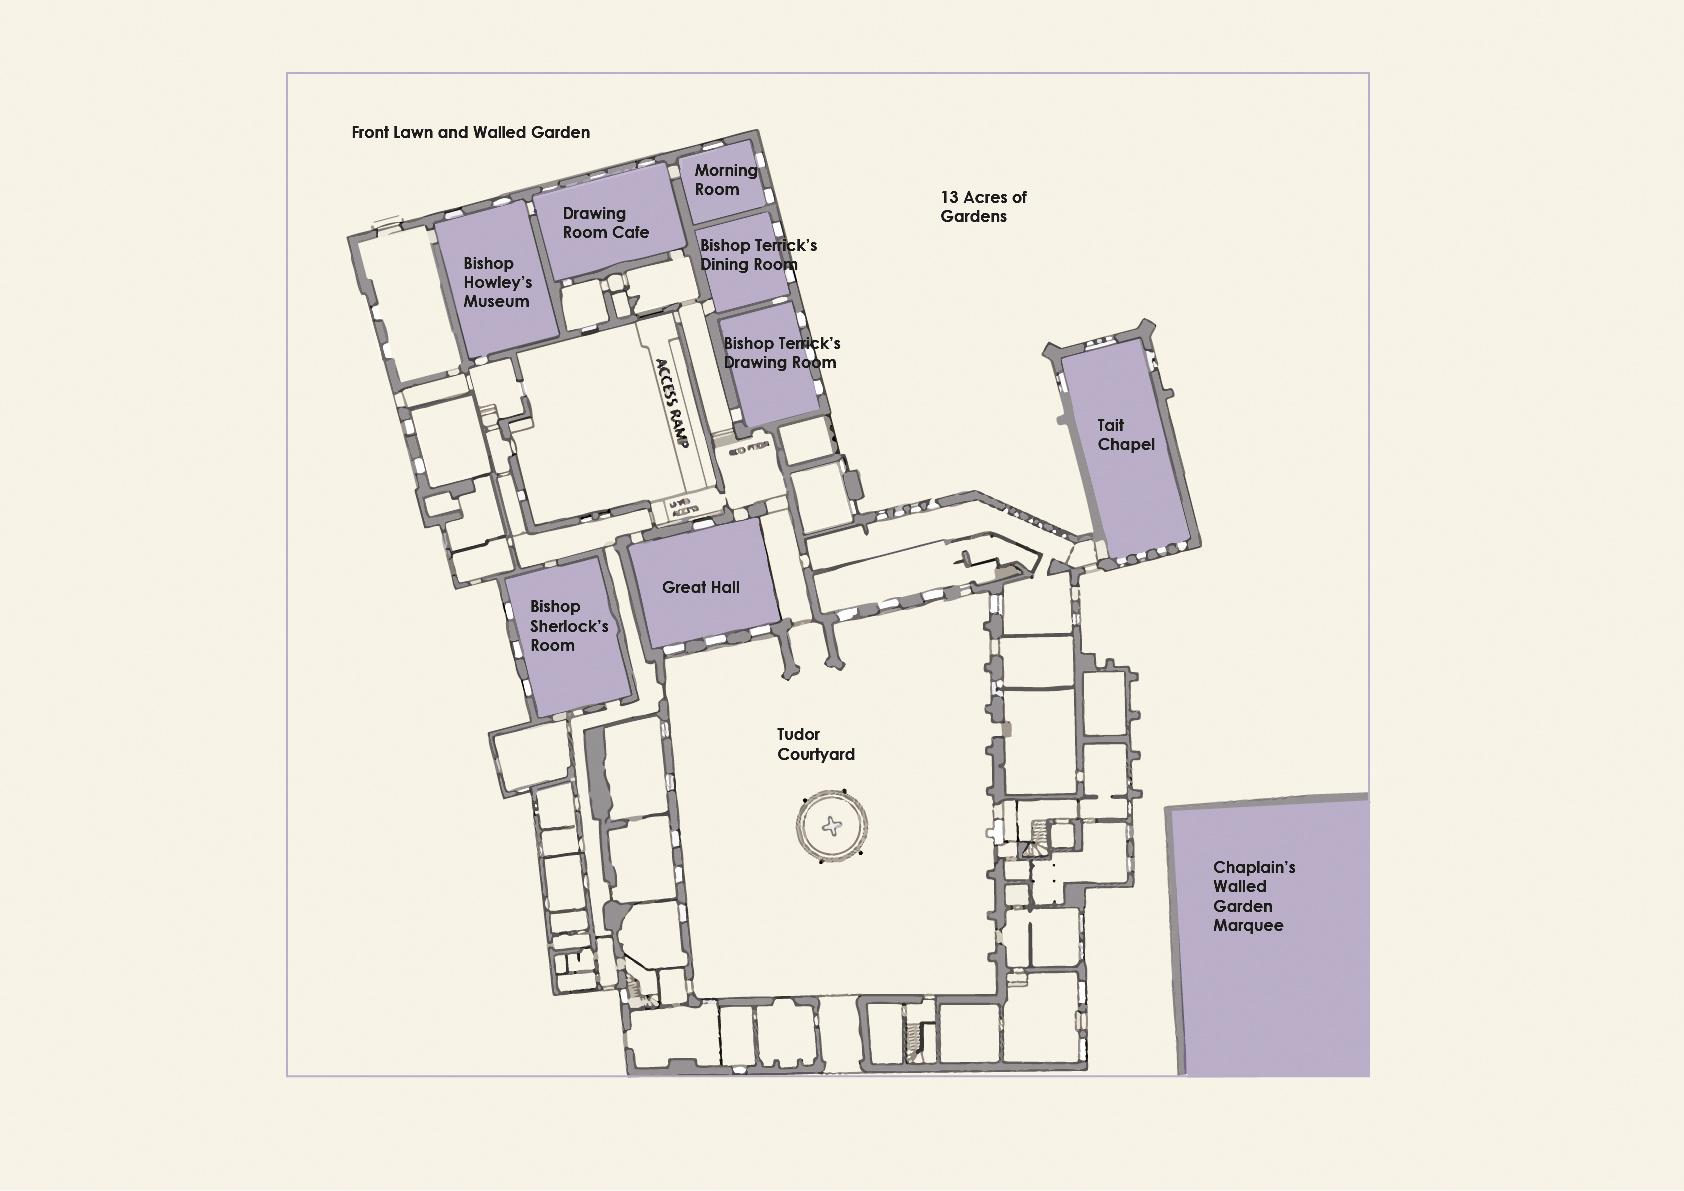 FP-MAP@4x-100-2-option2.jpg